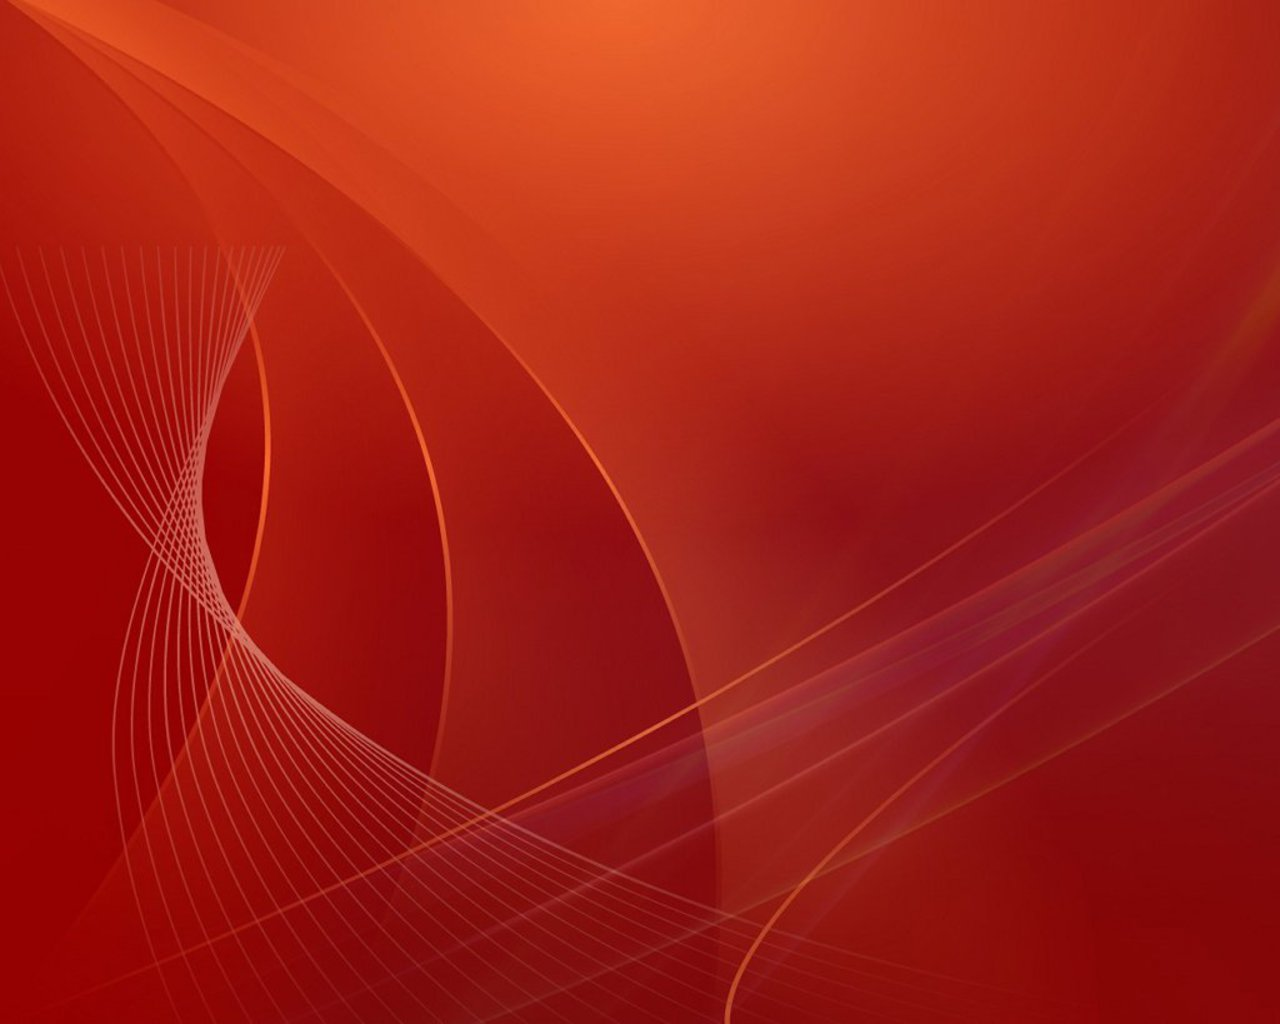 47 red design wallpaper on wallpapersafari red design wallpaper on wallpapersafari